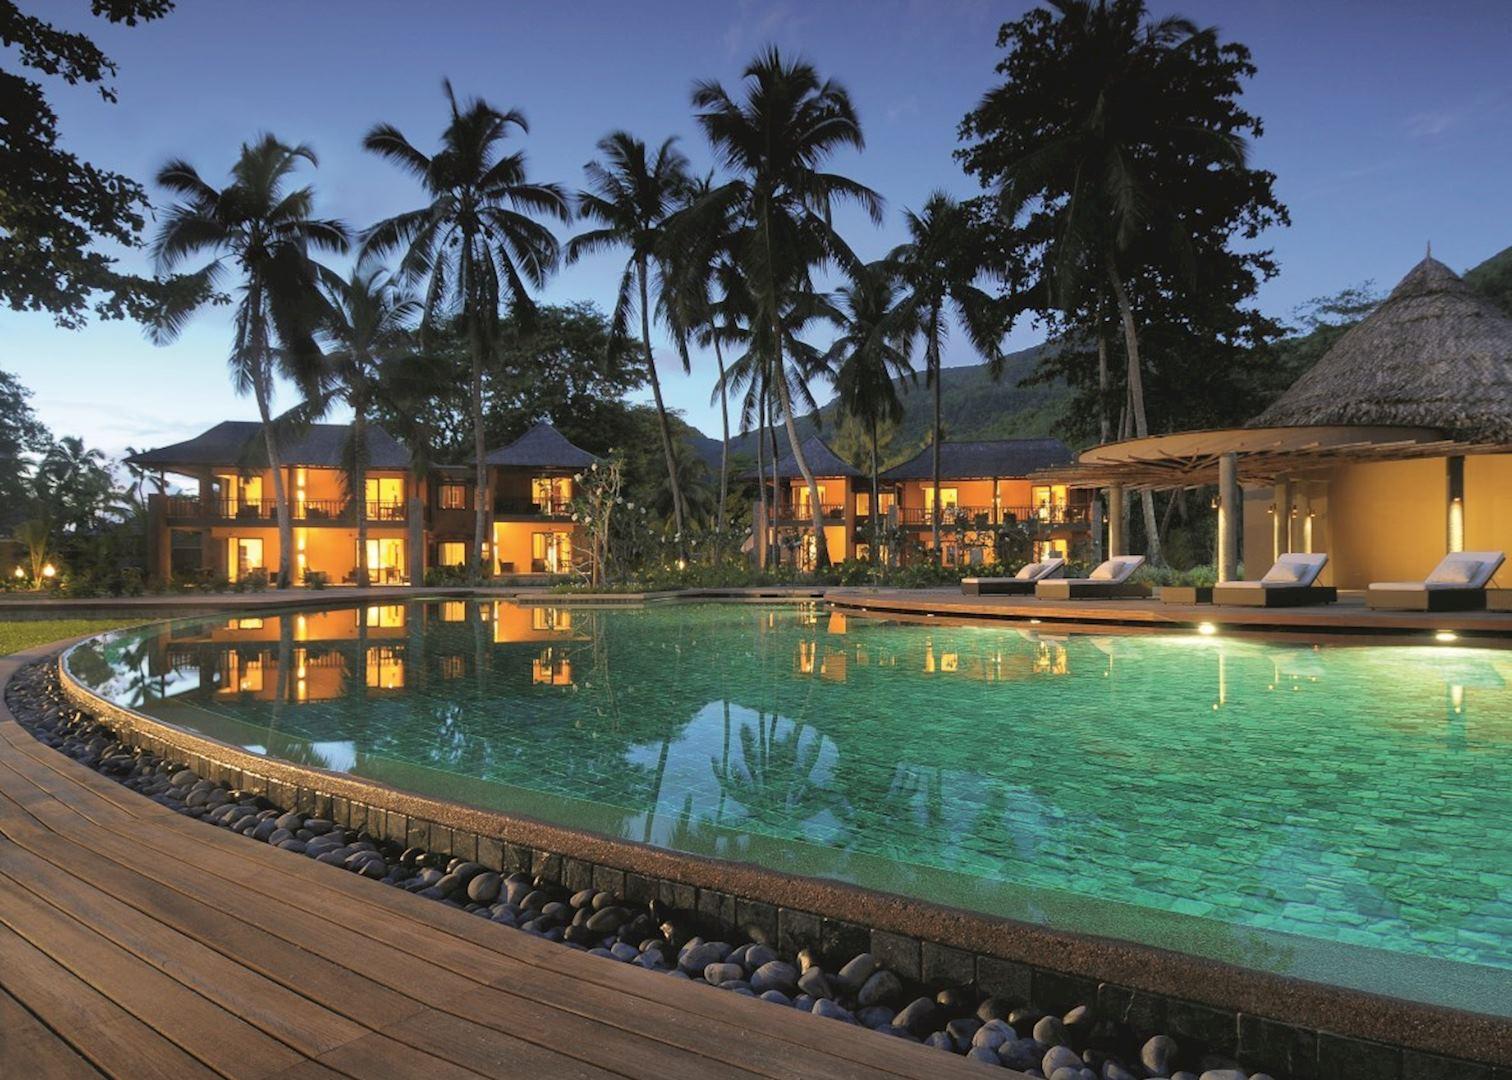 constance ephelia resort mah island audley travel. Black Bedroom Furniture Sets. Home Design Ideas